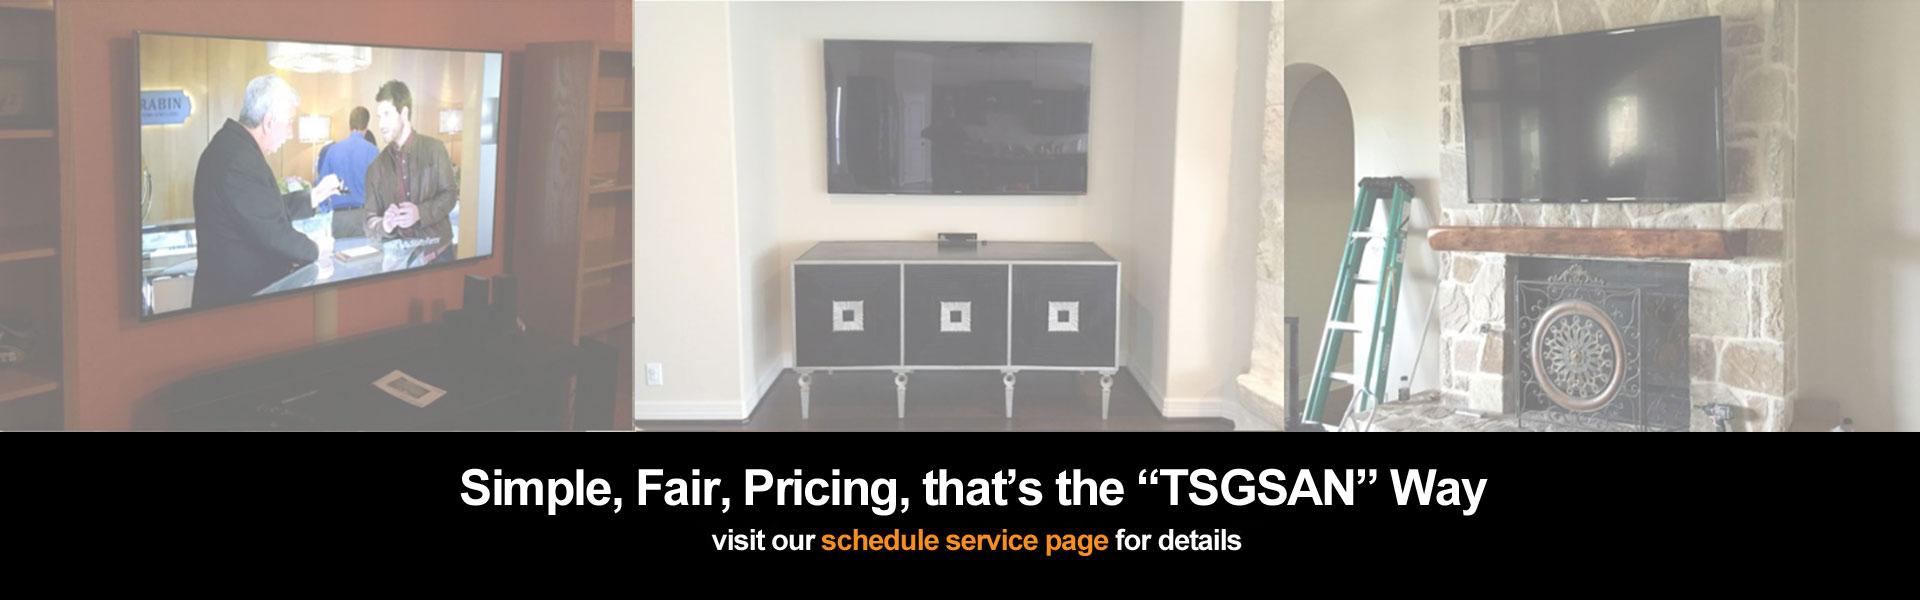 TV-Mounting-Banner-2